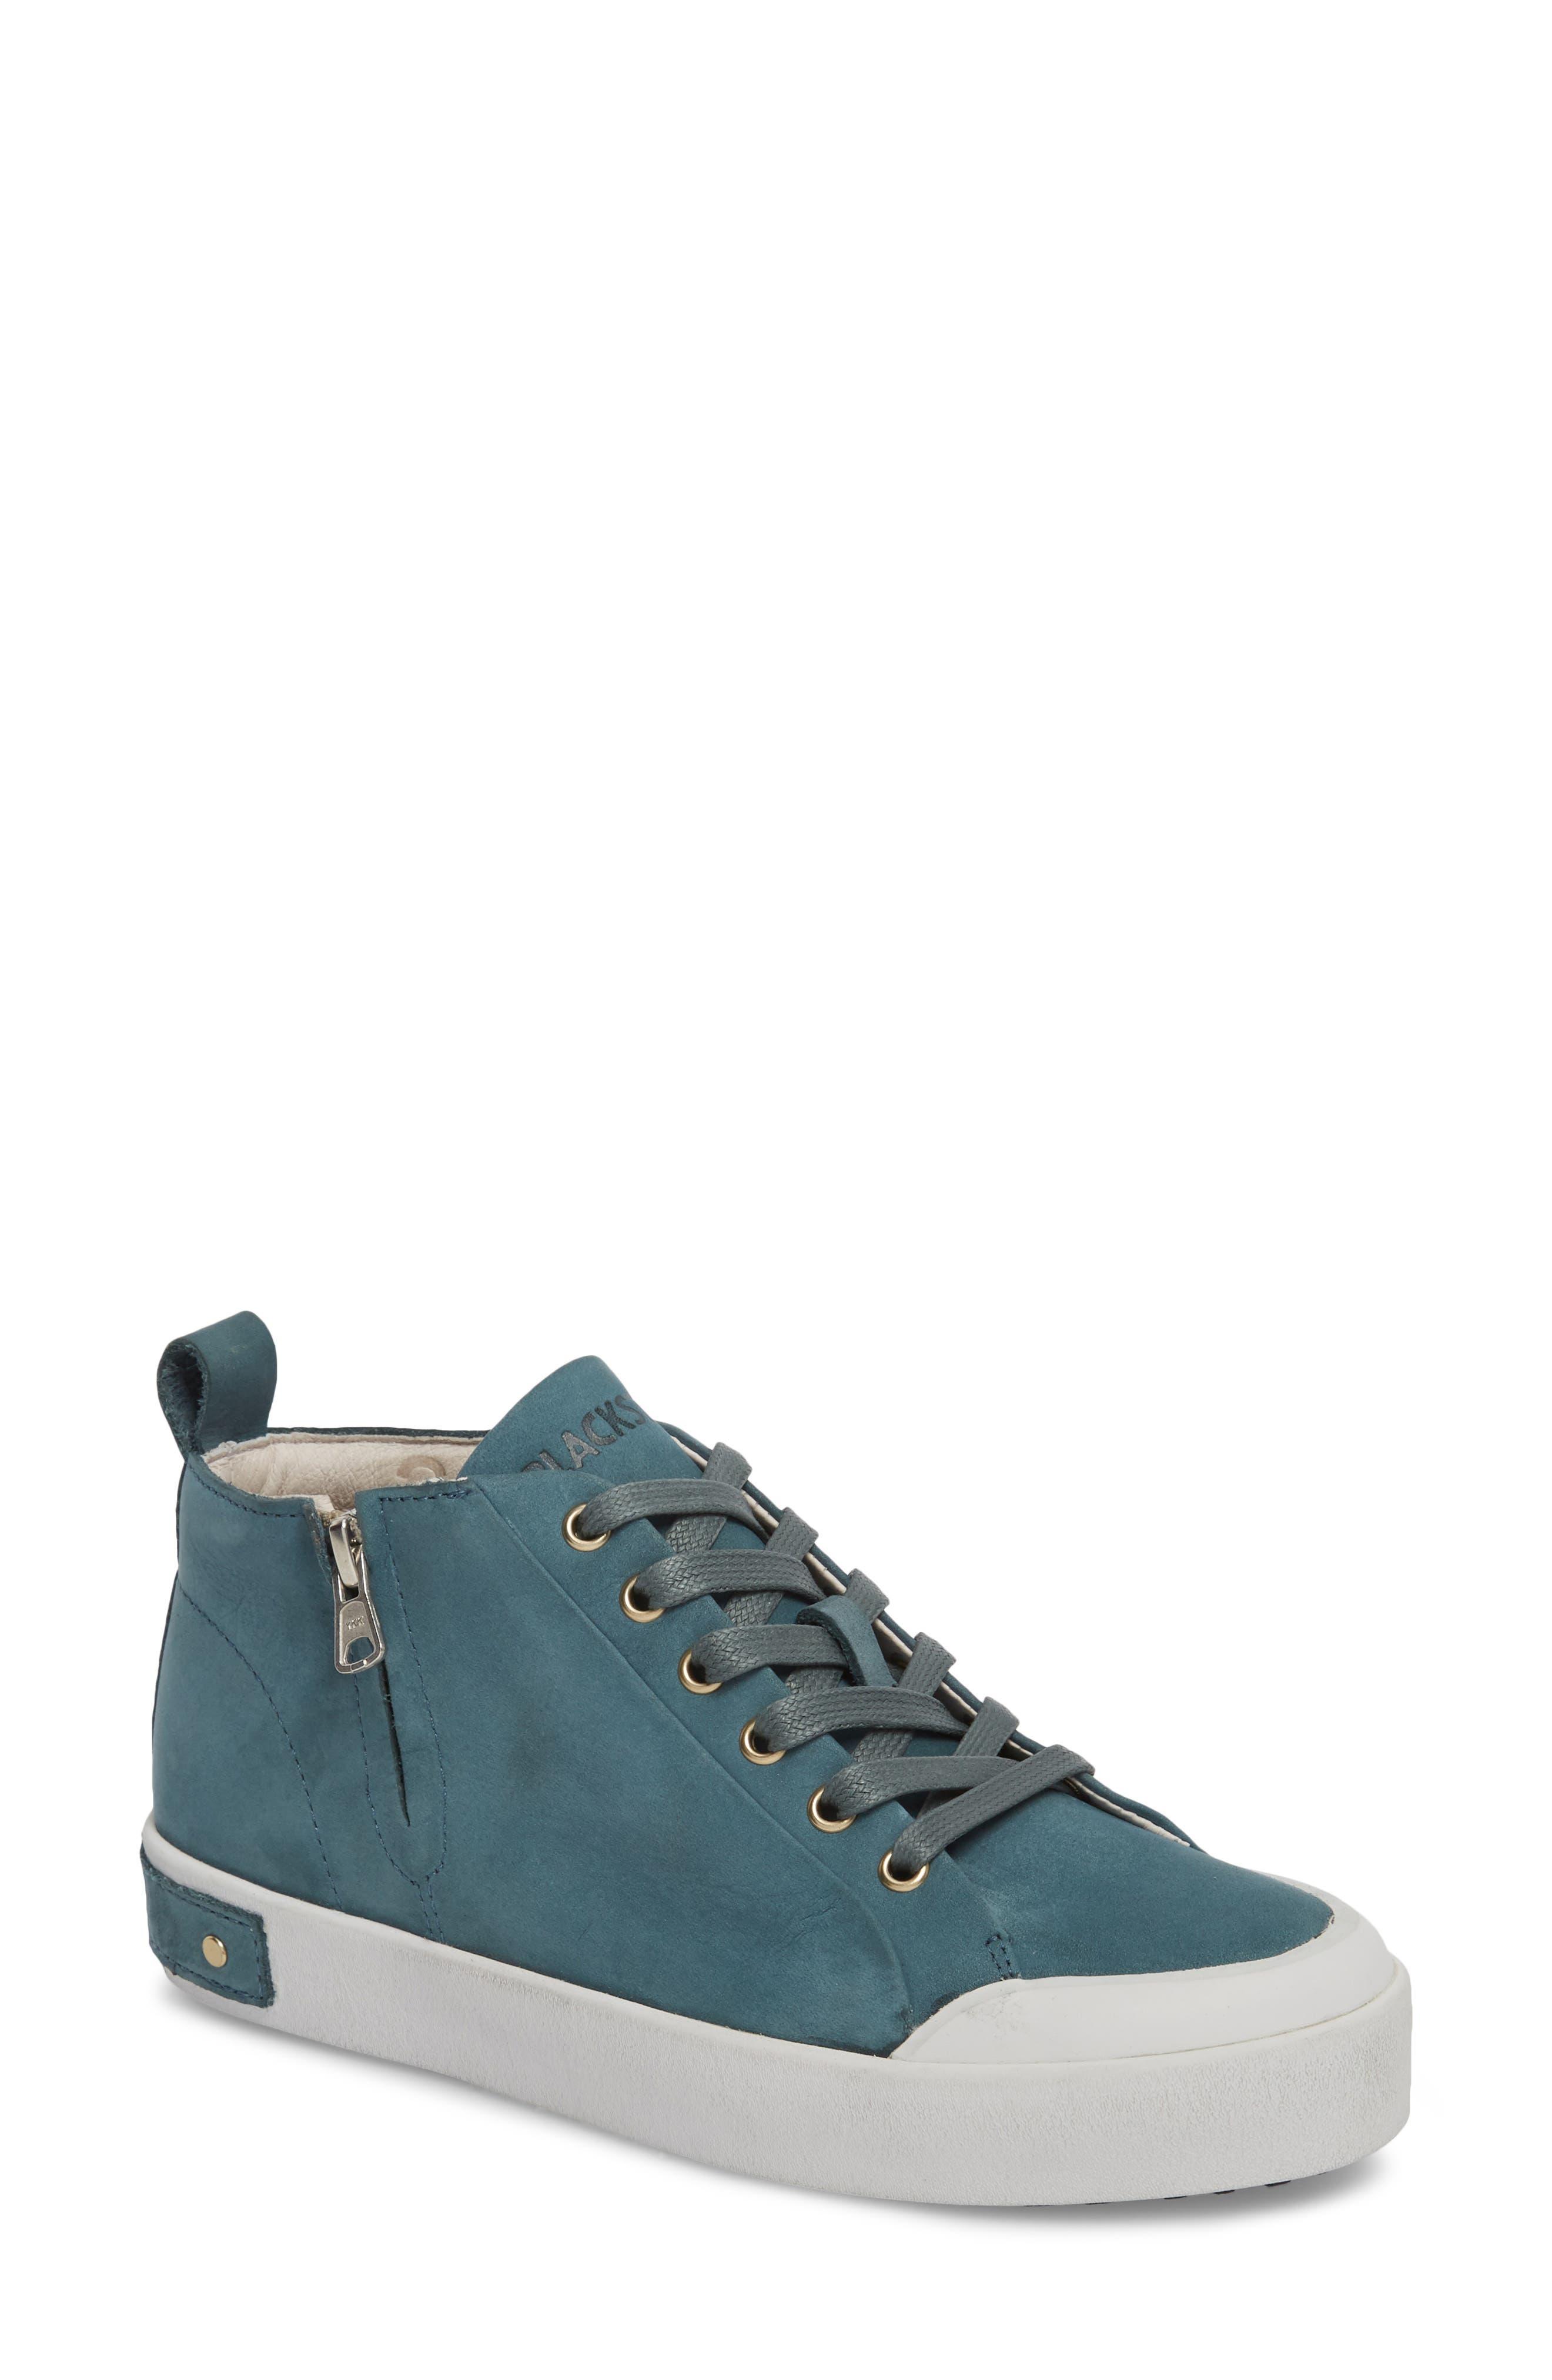 PL83 Mid Rise Sneaker,                             Main thumbnail 1, color,                             Mallard Blue Leather